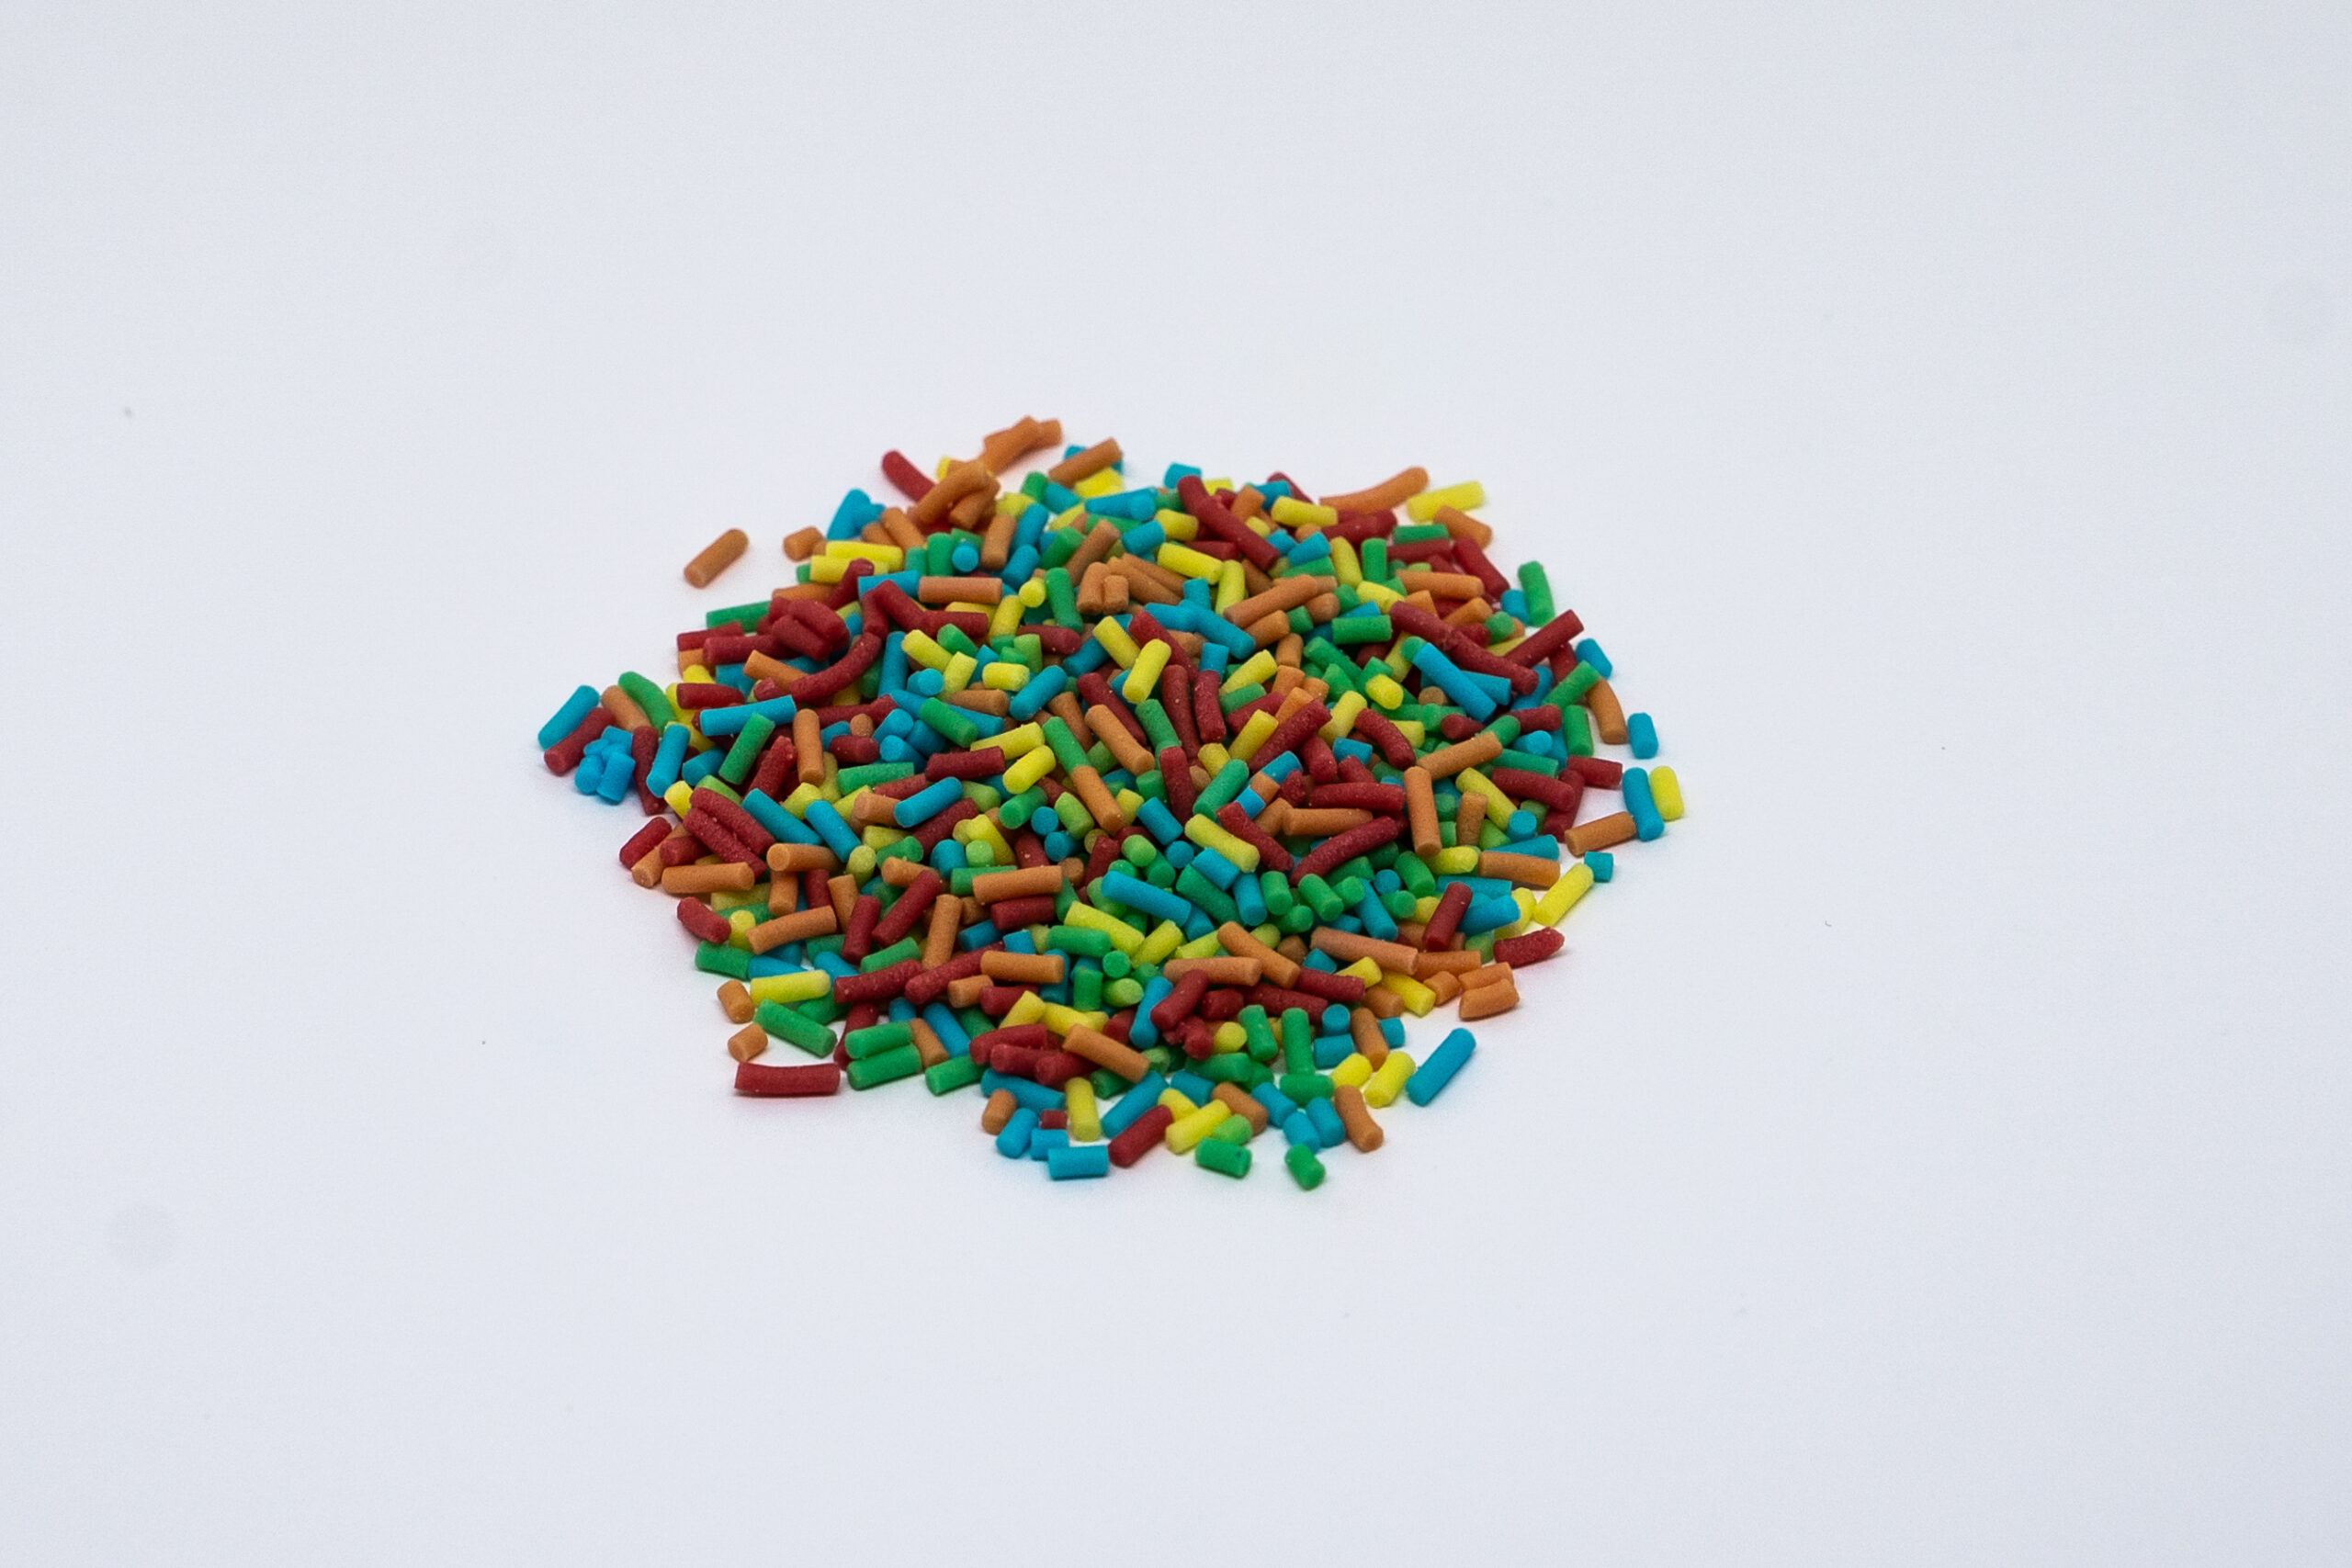 Sprinkles mix